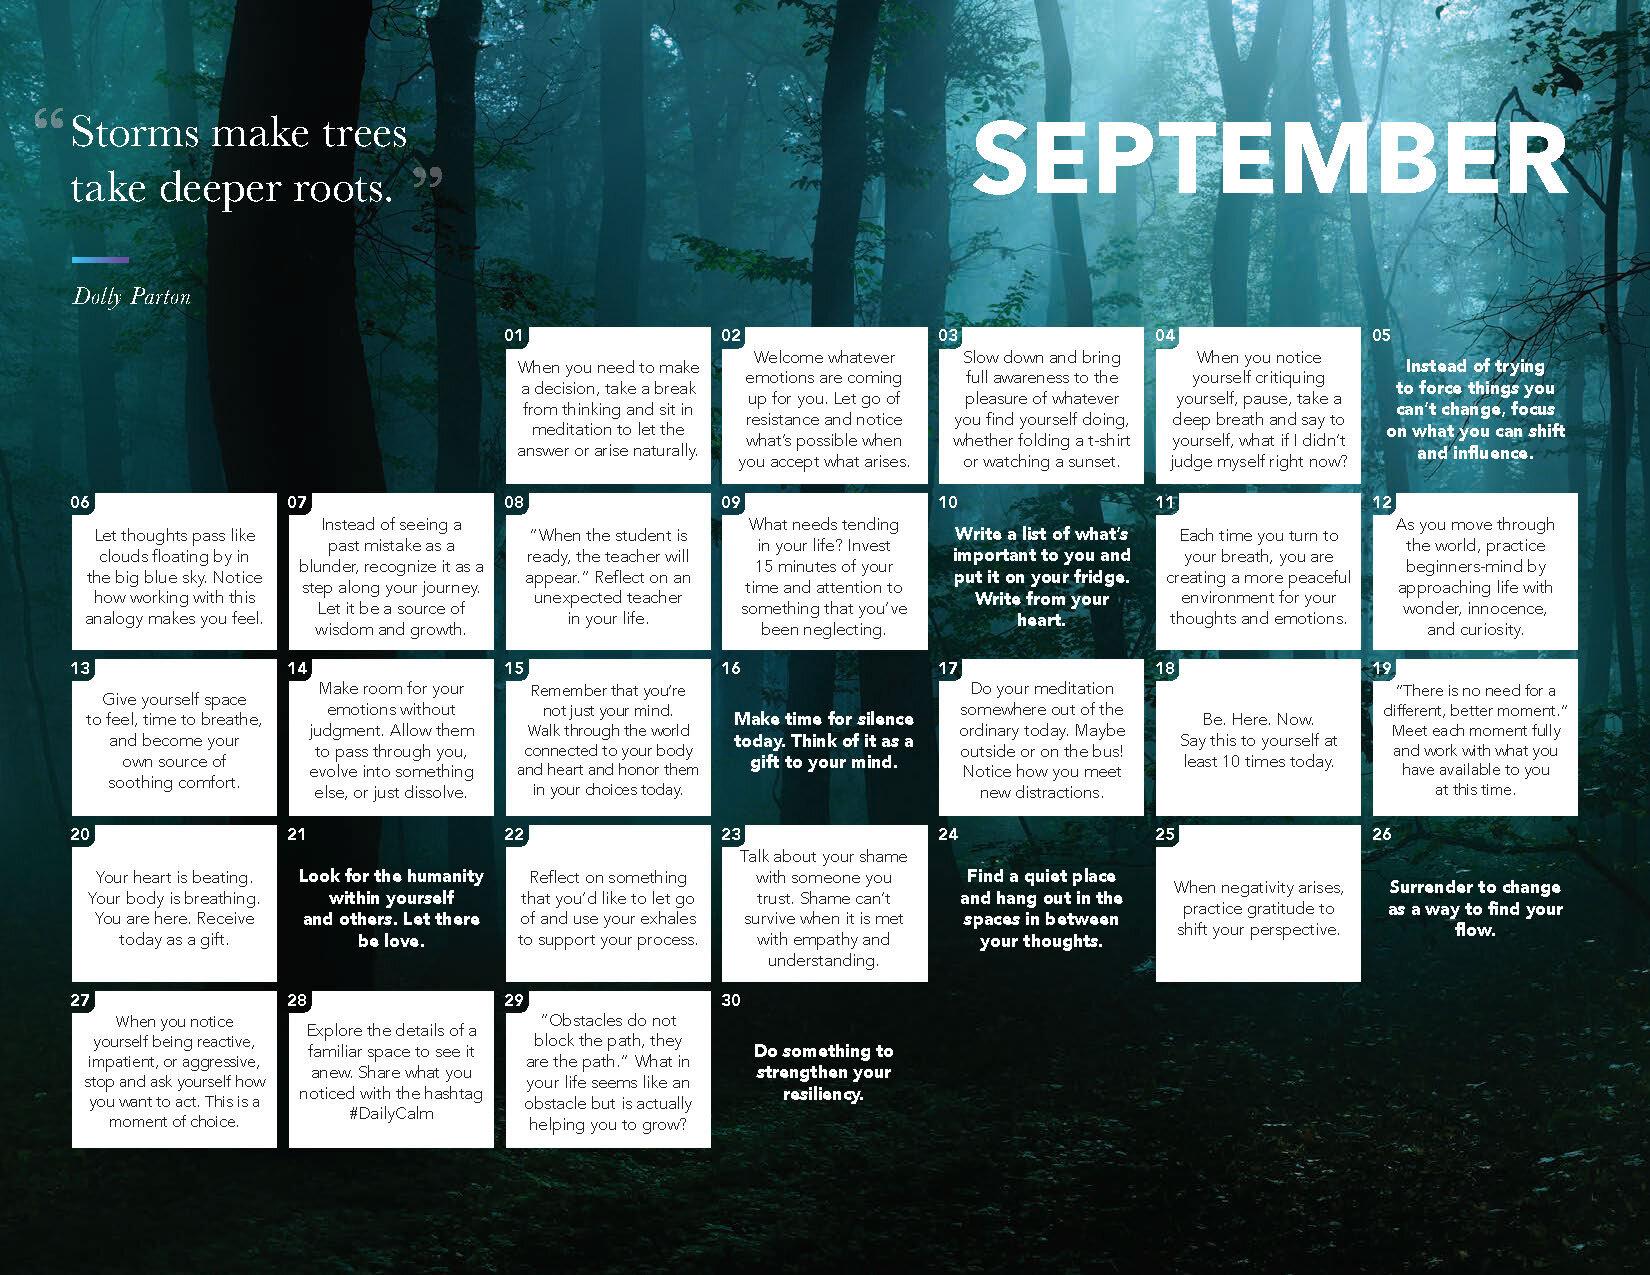 2020 Daily Calm Calendar_Page_10.jpg